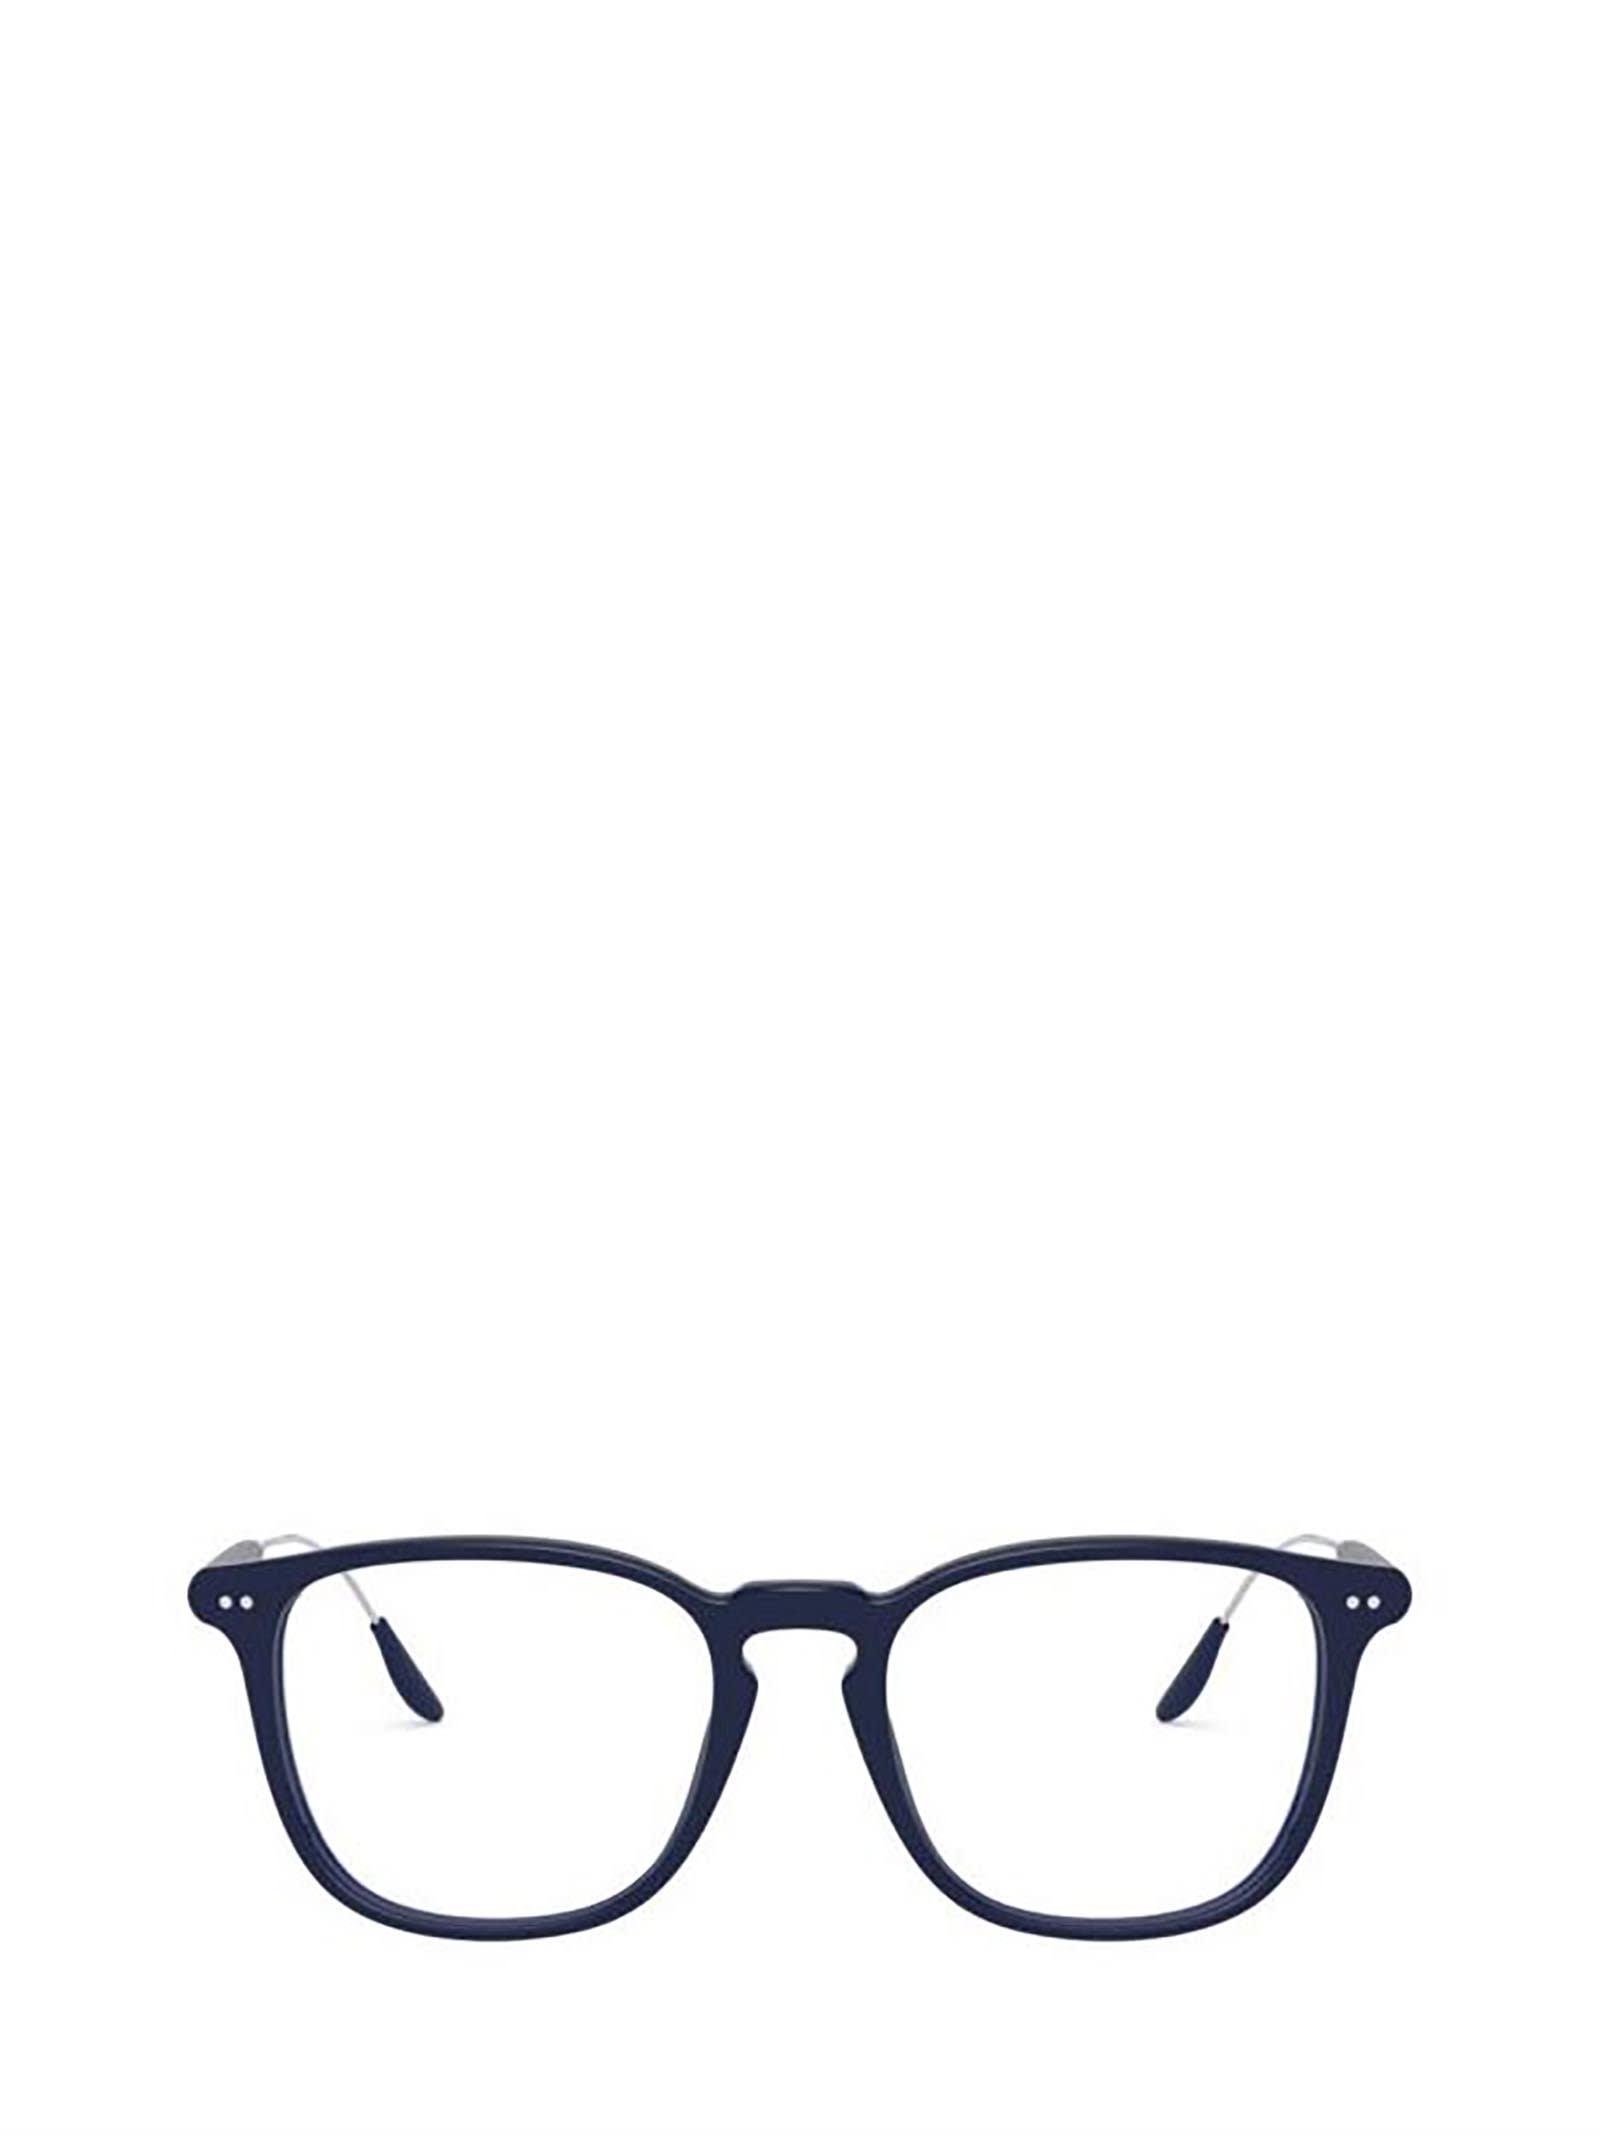 Ralph Lauren Ralph Lauren Rl6196p Blue Glasses